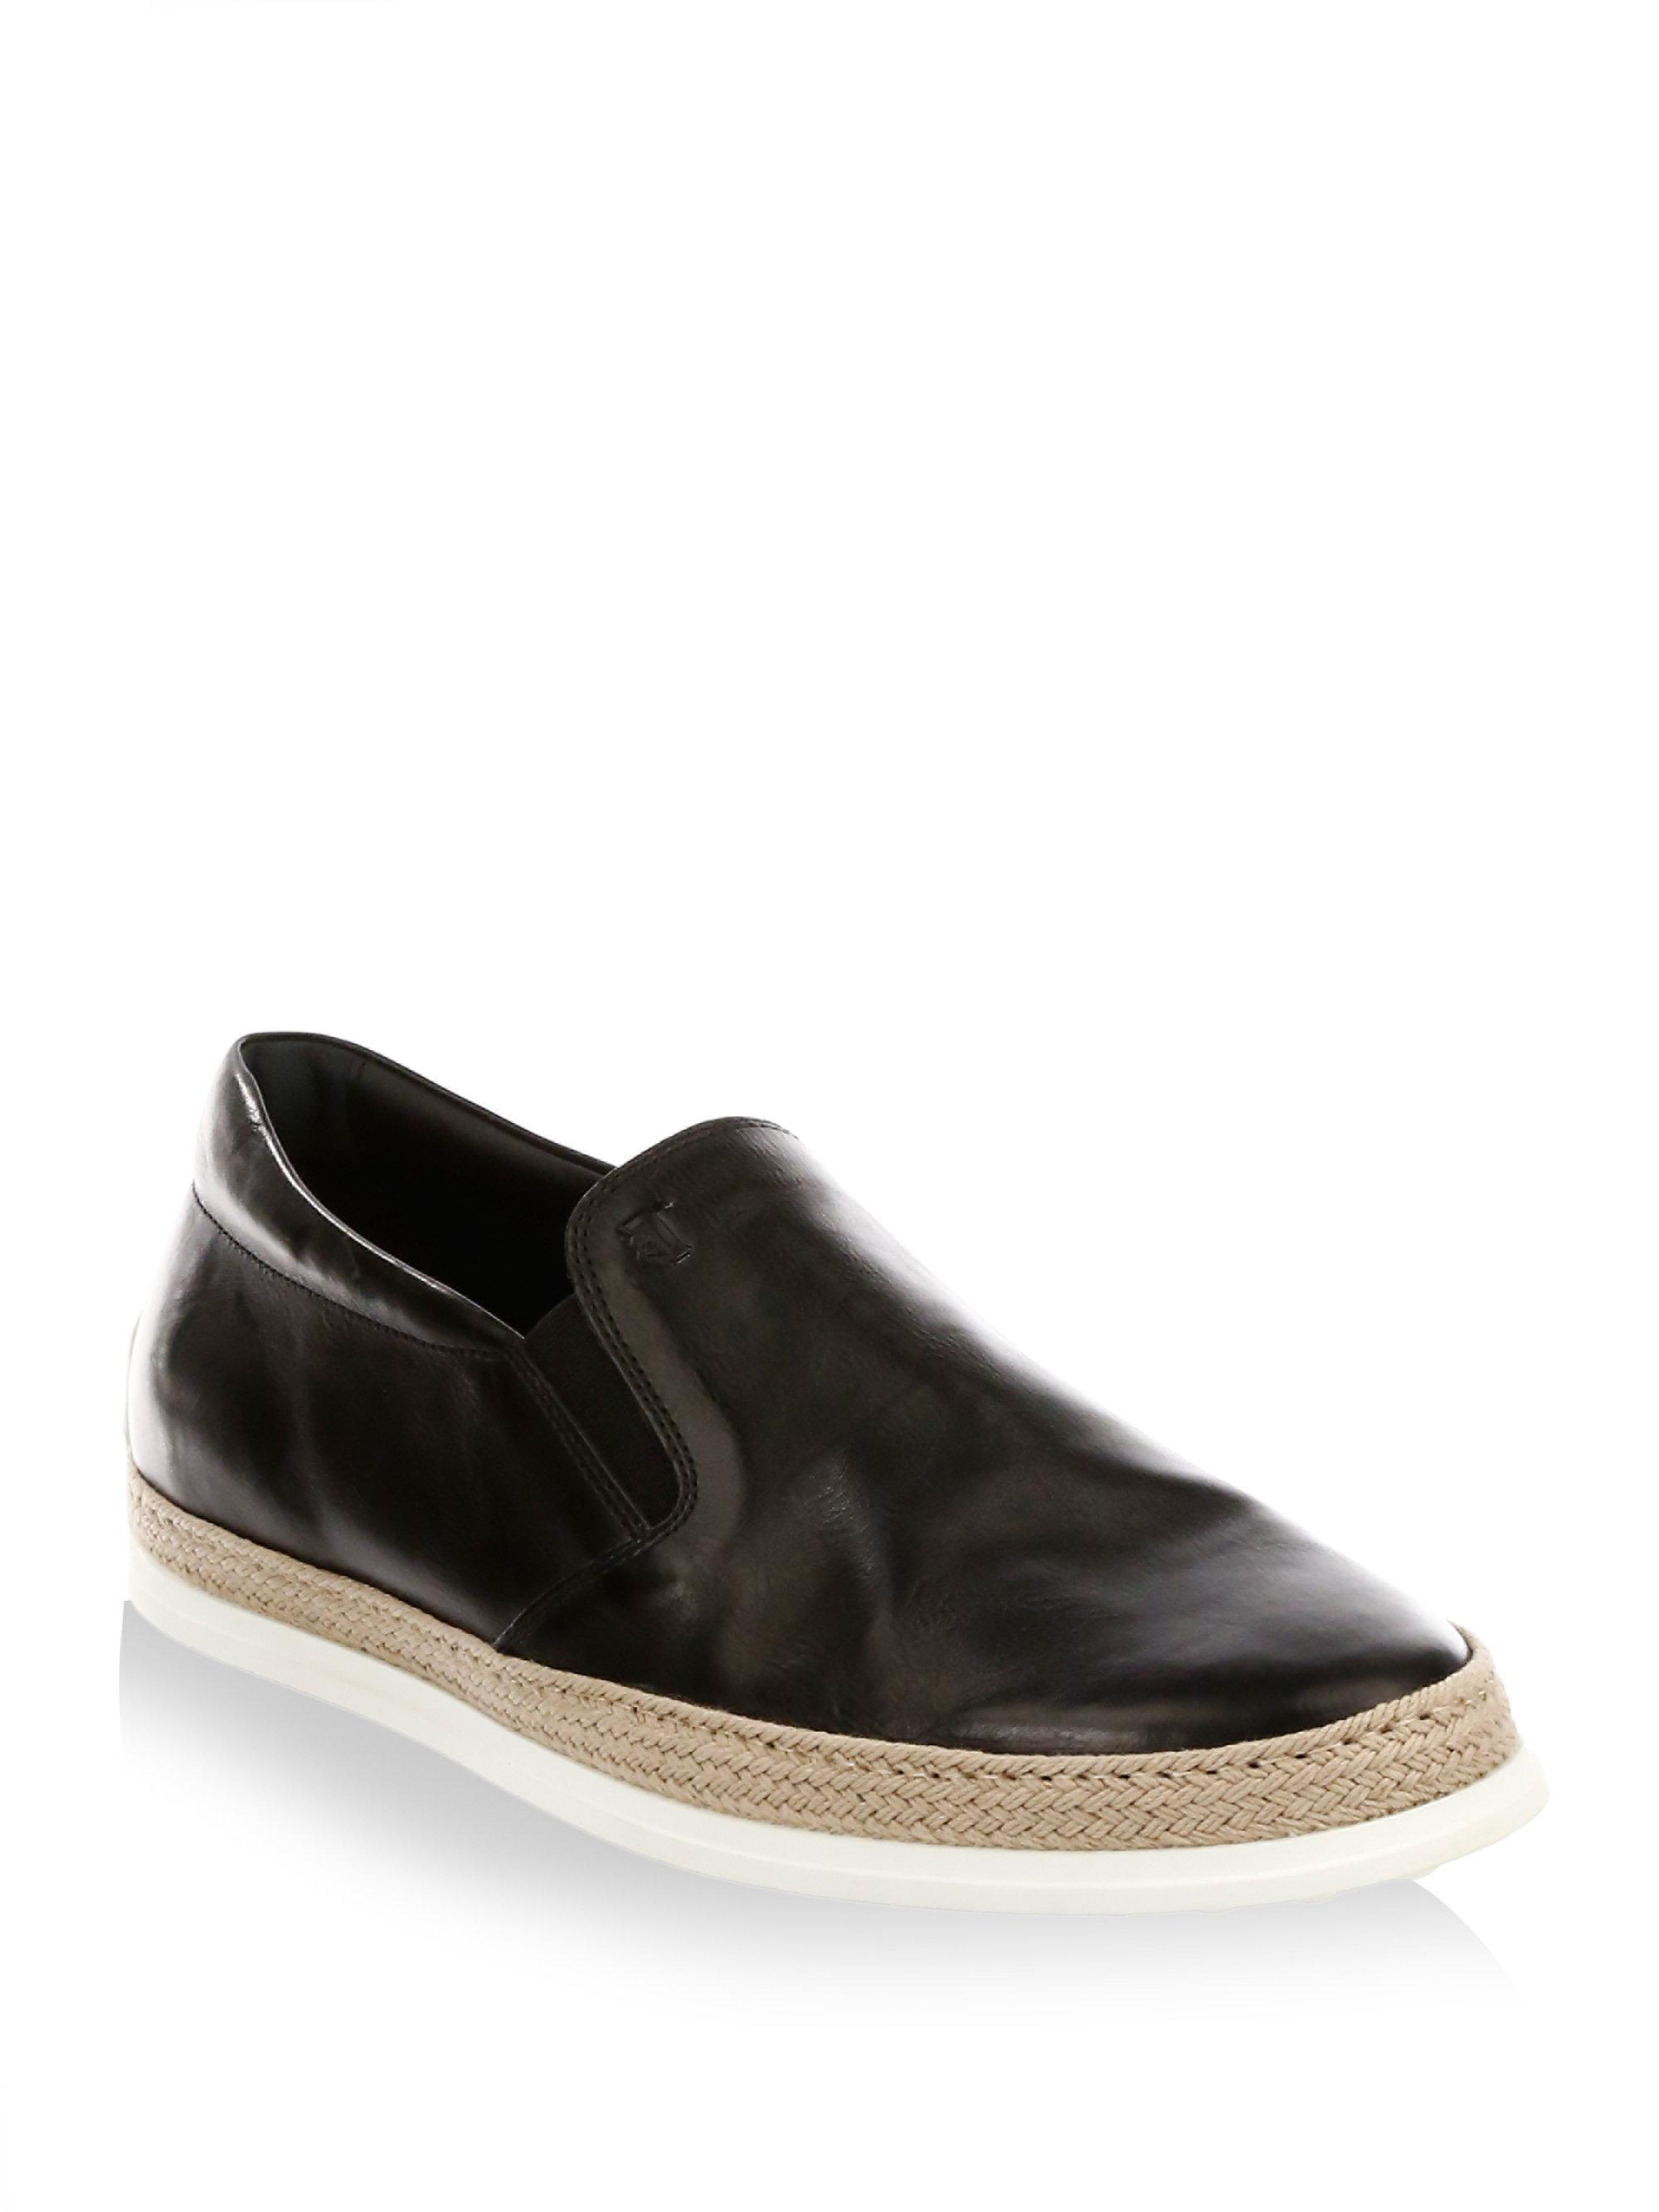 Tod's. Women's Black Leather Slip-on Espadrille Sneakers